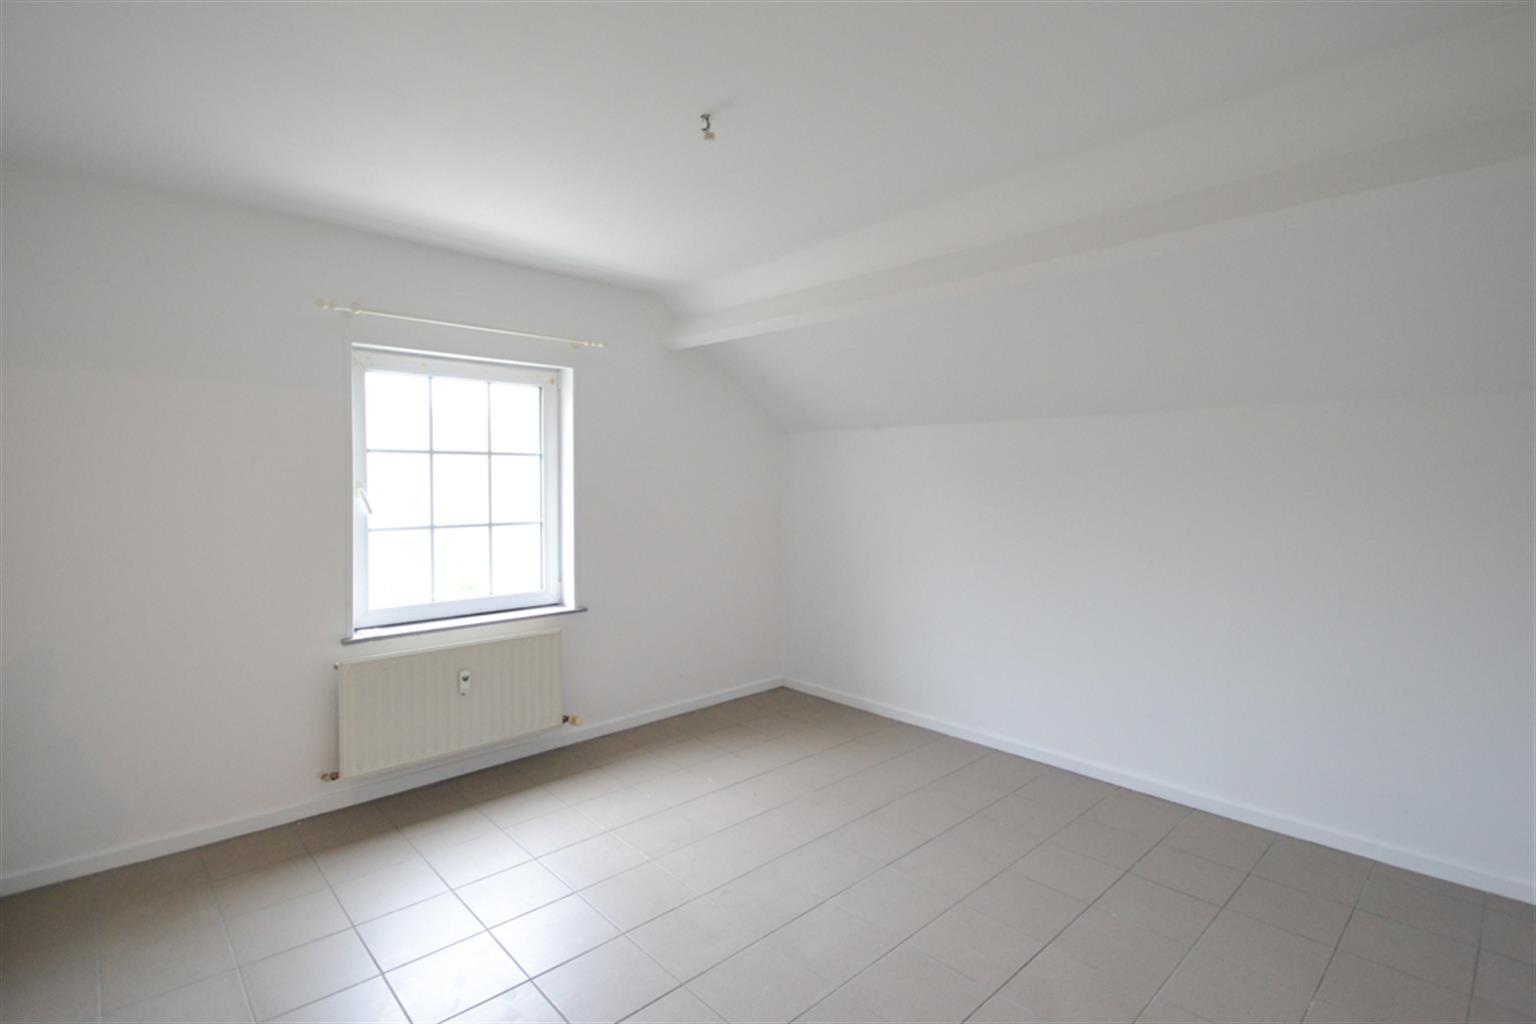 Appartement - Leval-Trahegnies - #3703788-3